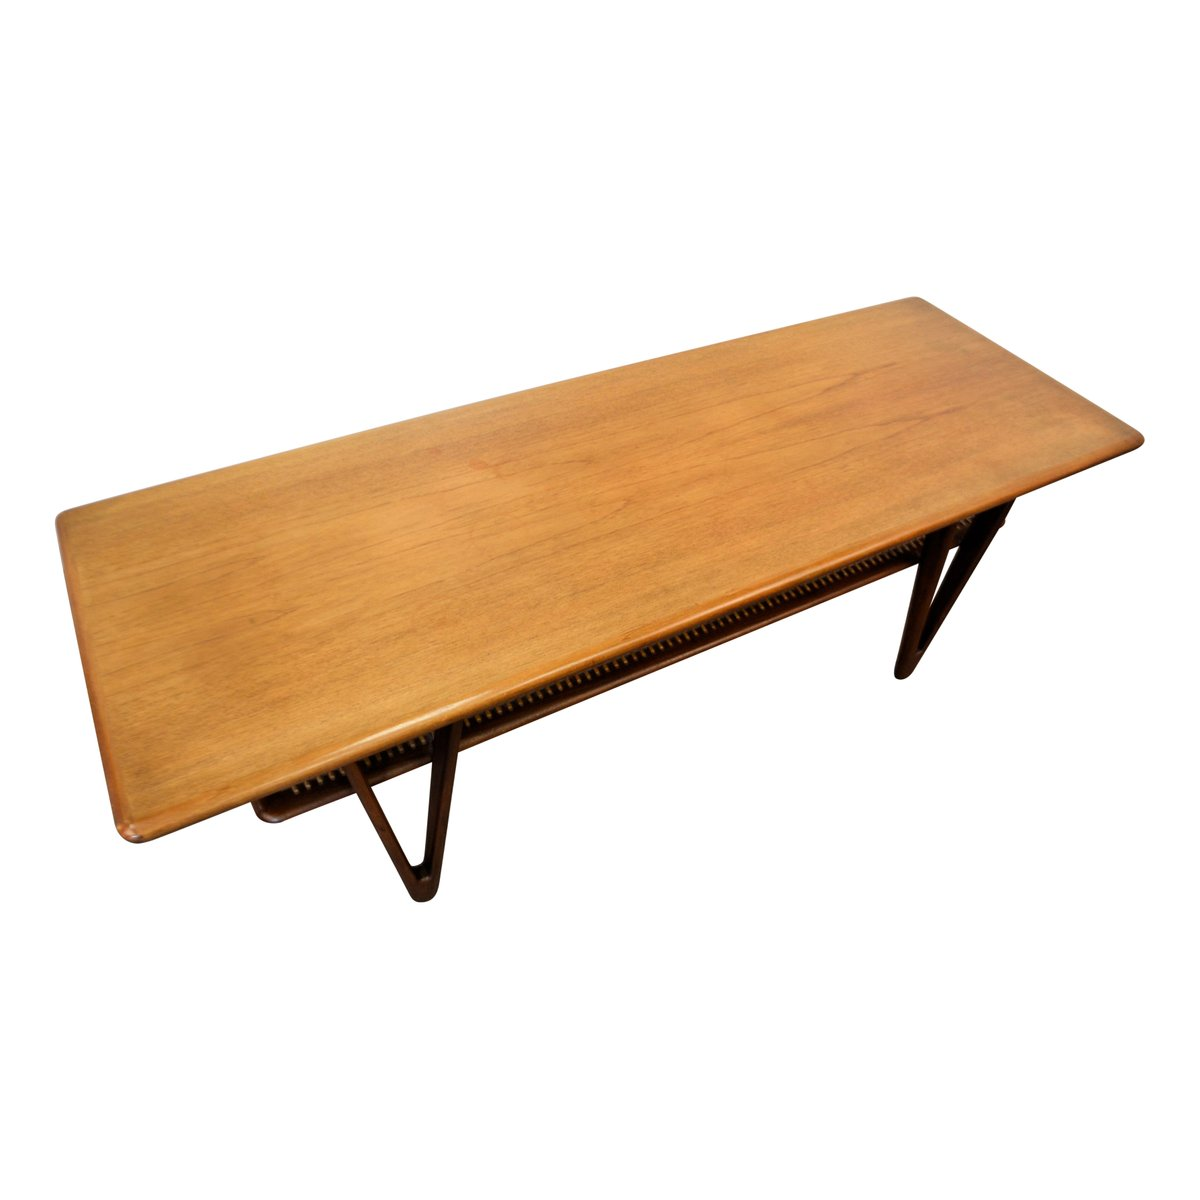 Teak Atomic Coffee Table: Mid-Century Modern Danish Teak Coffee Table, 1950s For